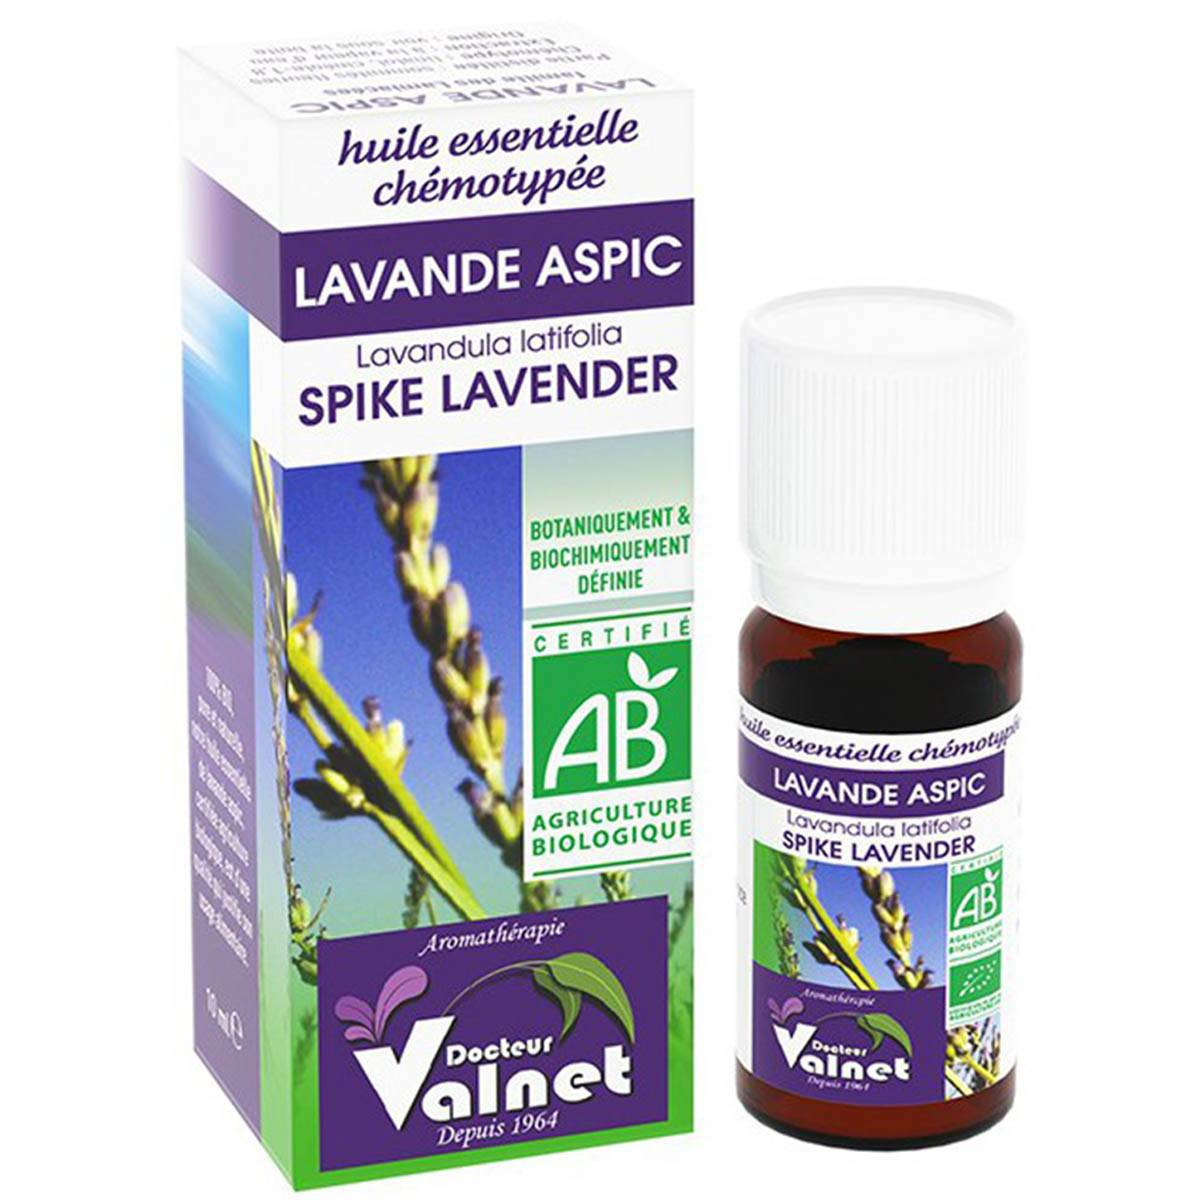 PRANAROM Dr valnet huile essentielle lavande aspic 10ml